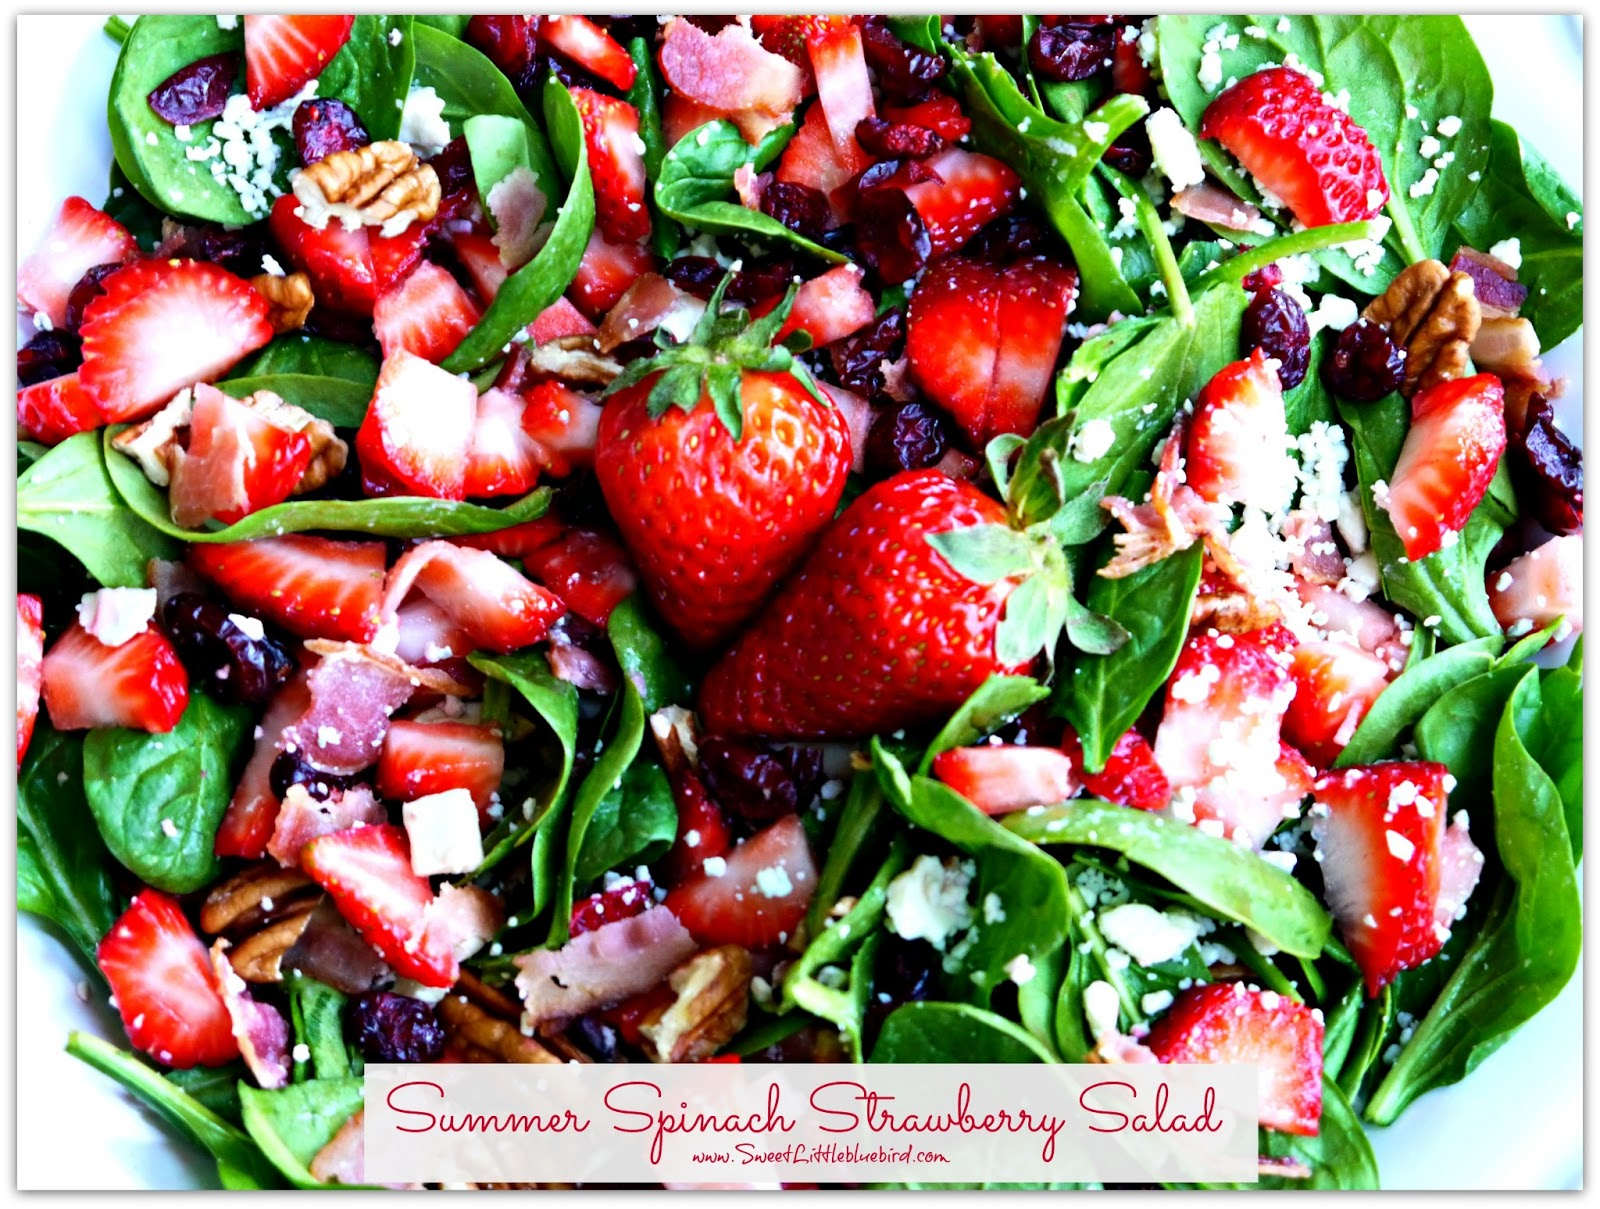 ... Bluebird: Tried & True Tuesday ~ Summer Spinach Strawberry Salad